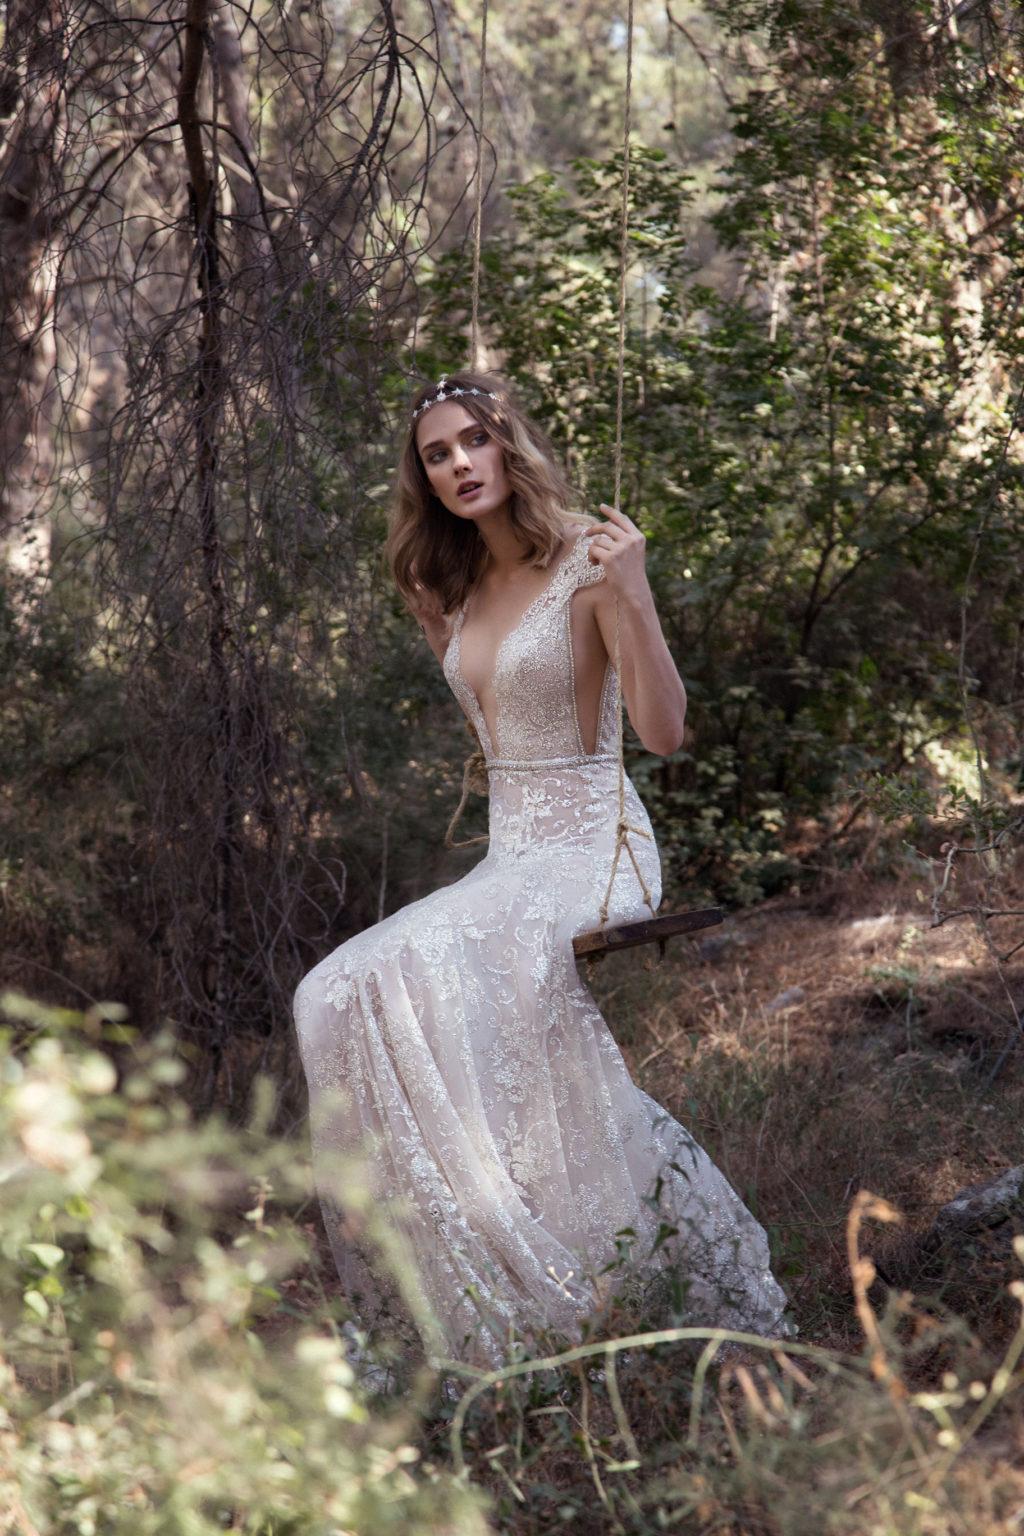 Galia Lahav 2017 13 - Nueva Colección Vestidos de Novia Galia Lahav 2017